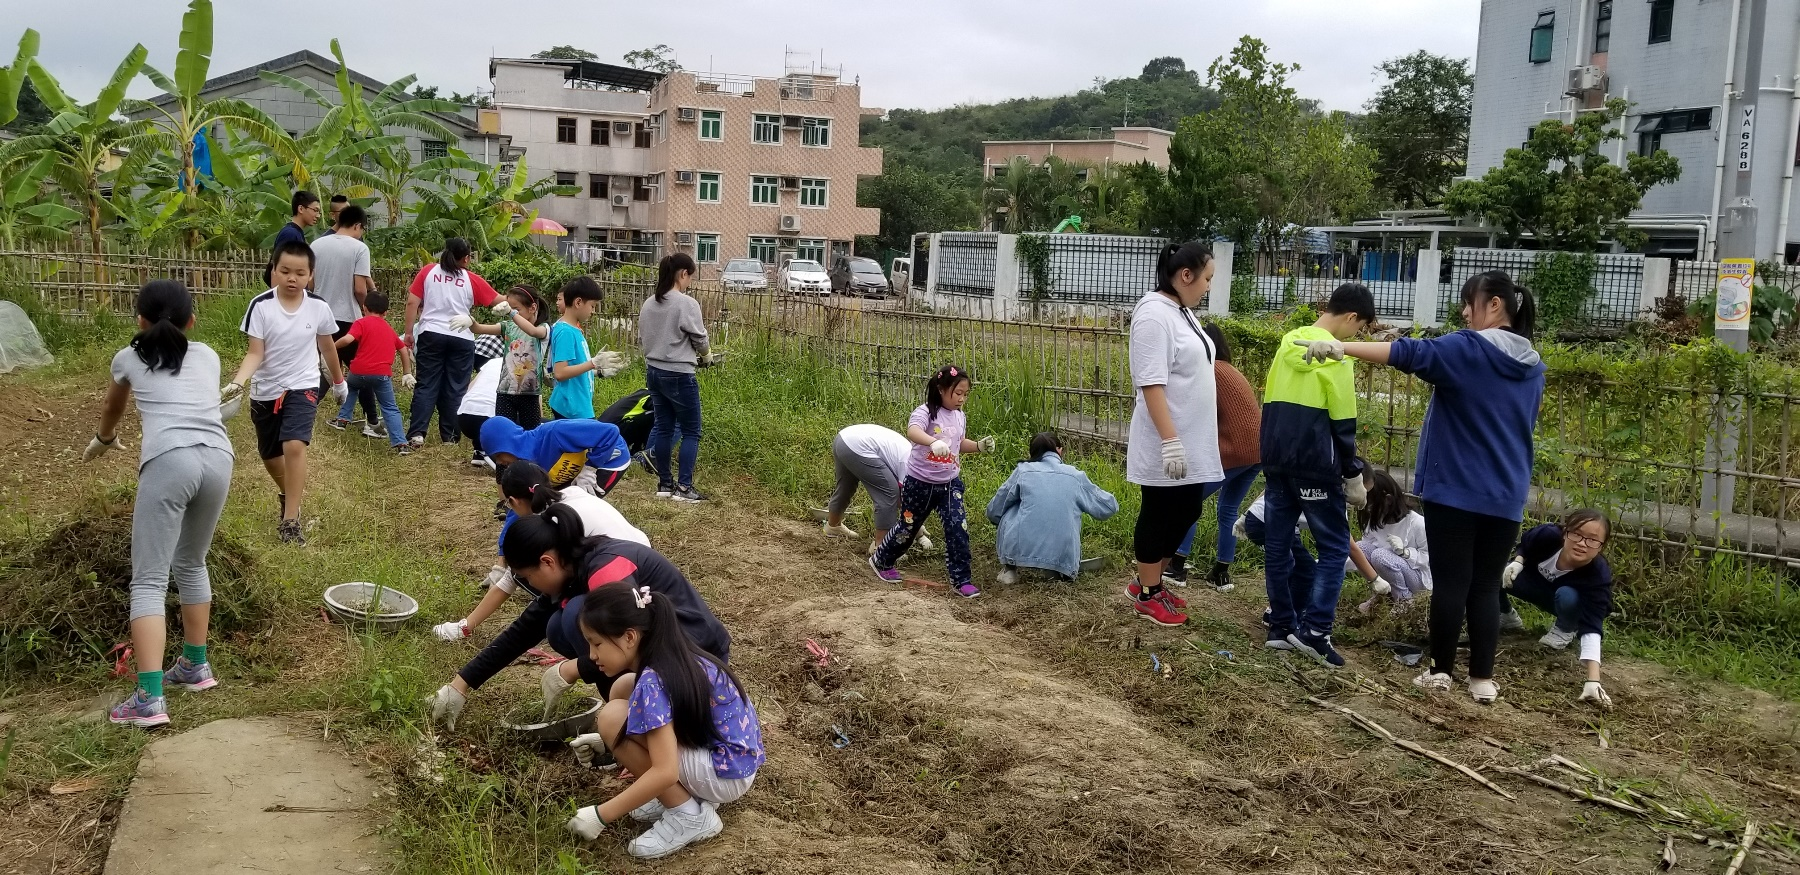 http://npc.edu.hk/sites/default/files/20181104_114929.jpg